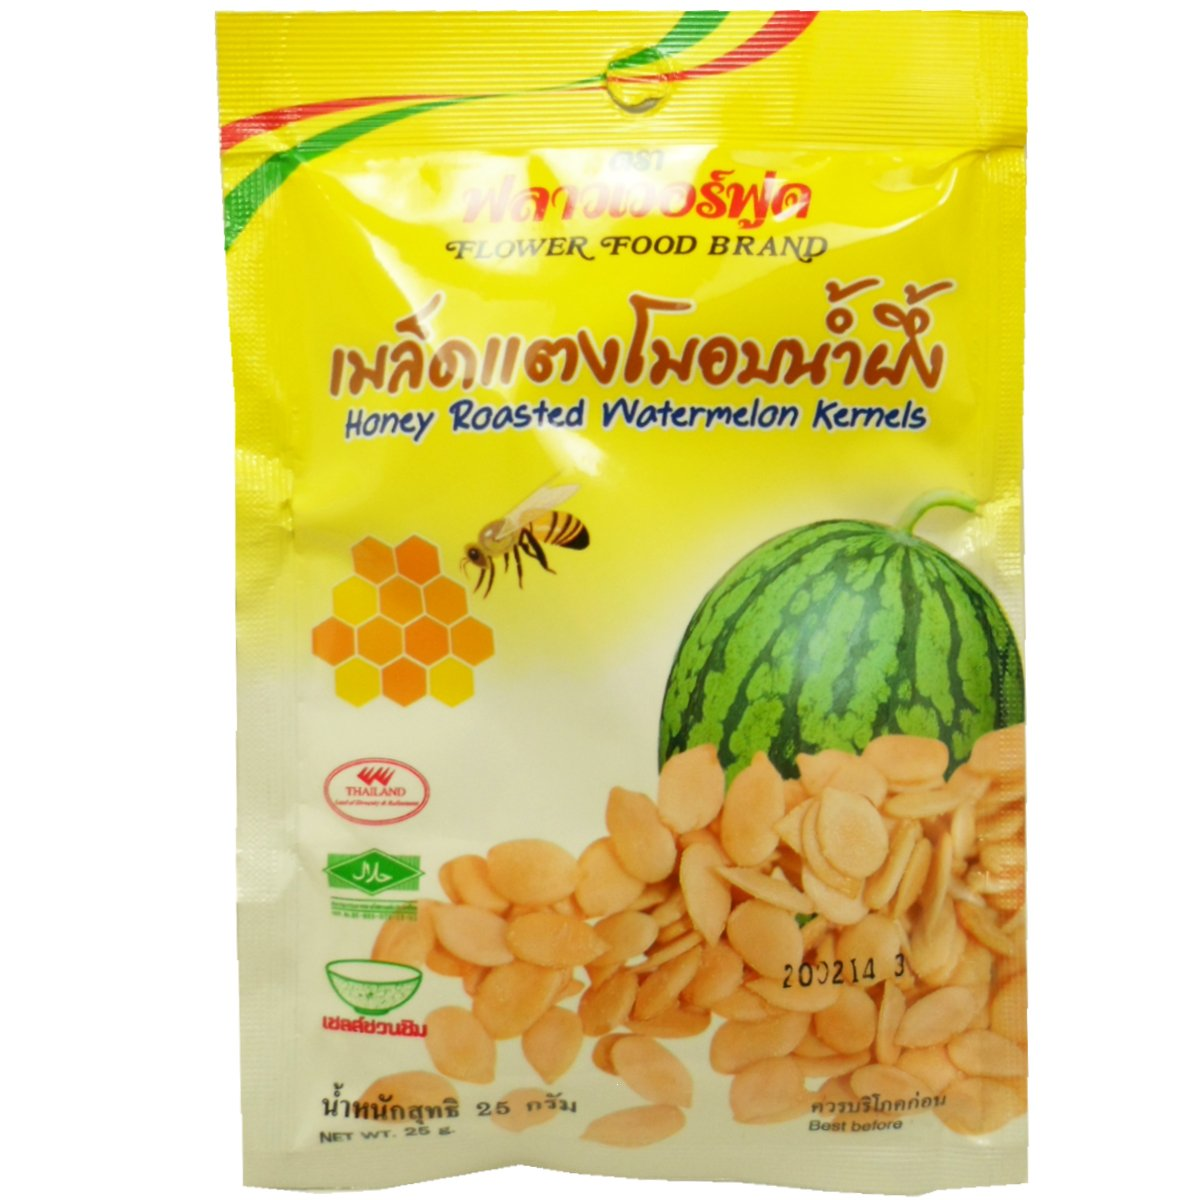 Honey Roasted Watermelon Kernels Snack Net Wt 25 G (0.88 Oz) X 6 Bags Organic Herbal Food